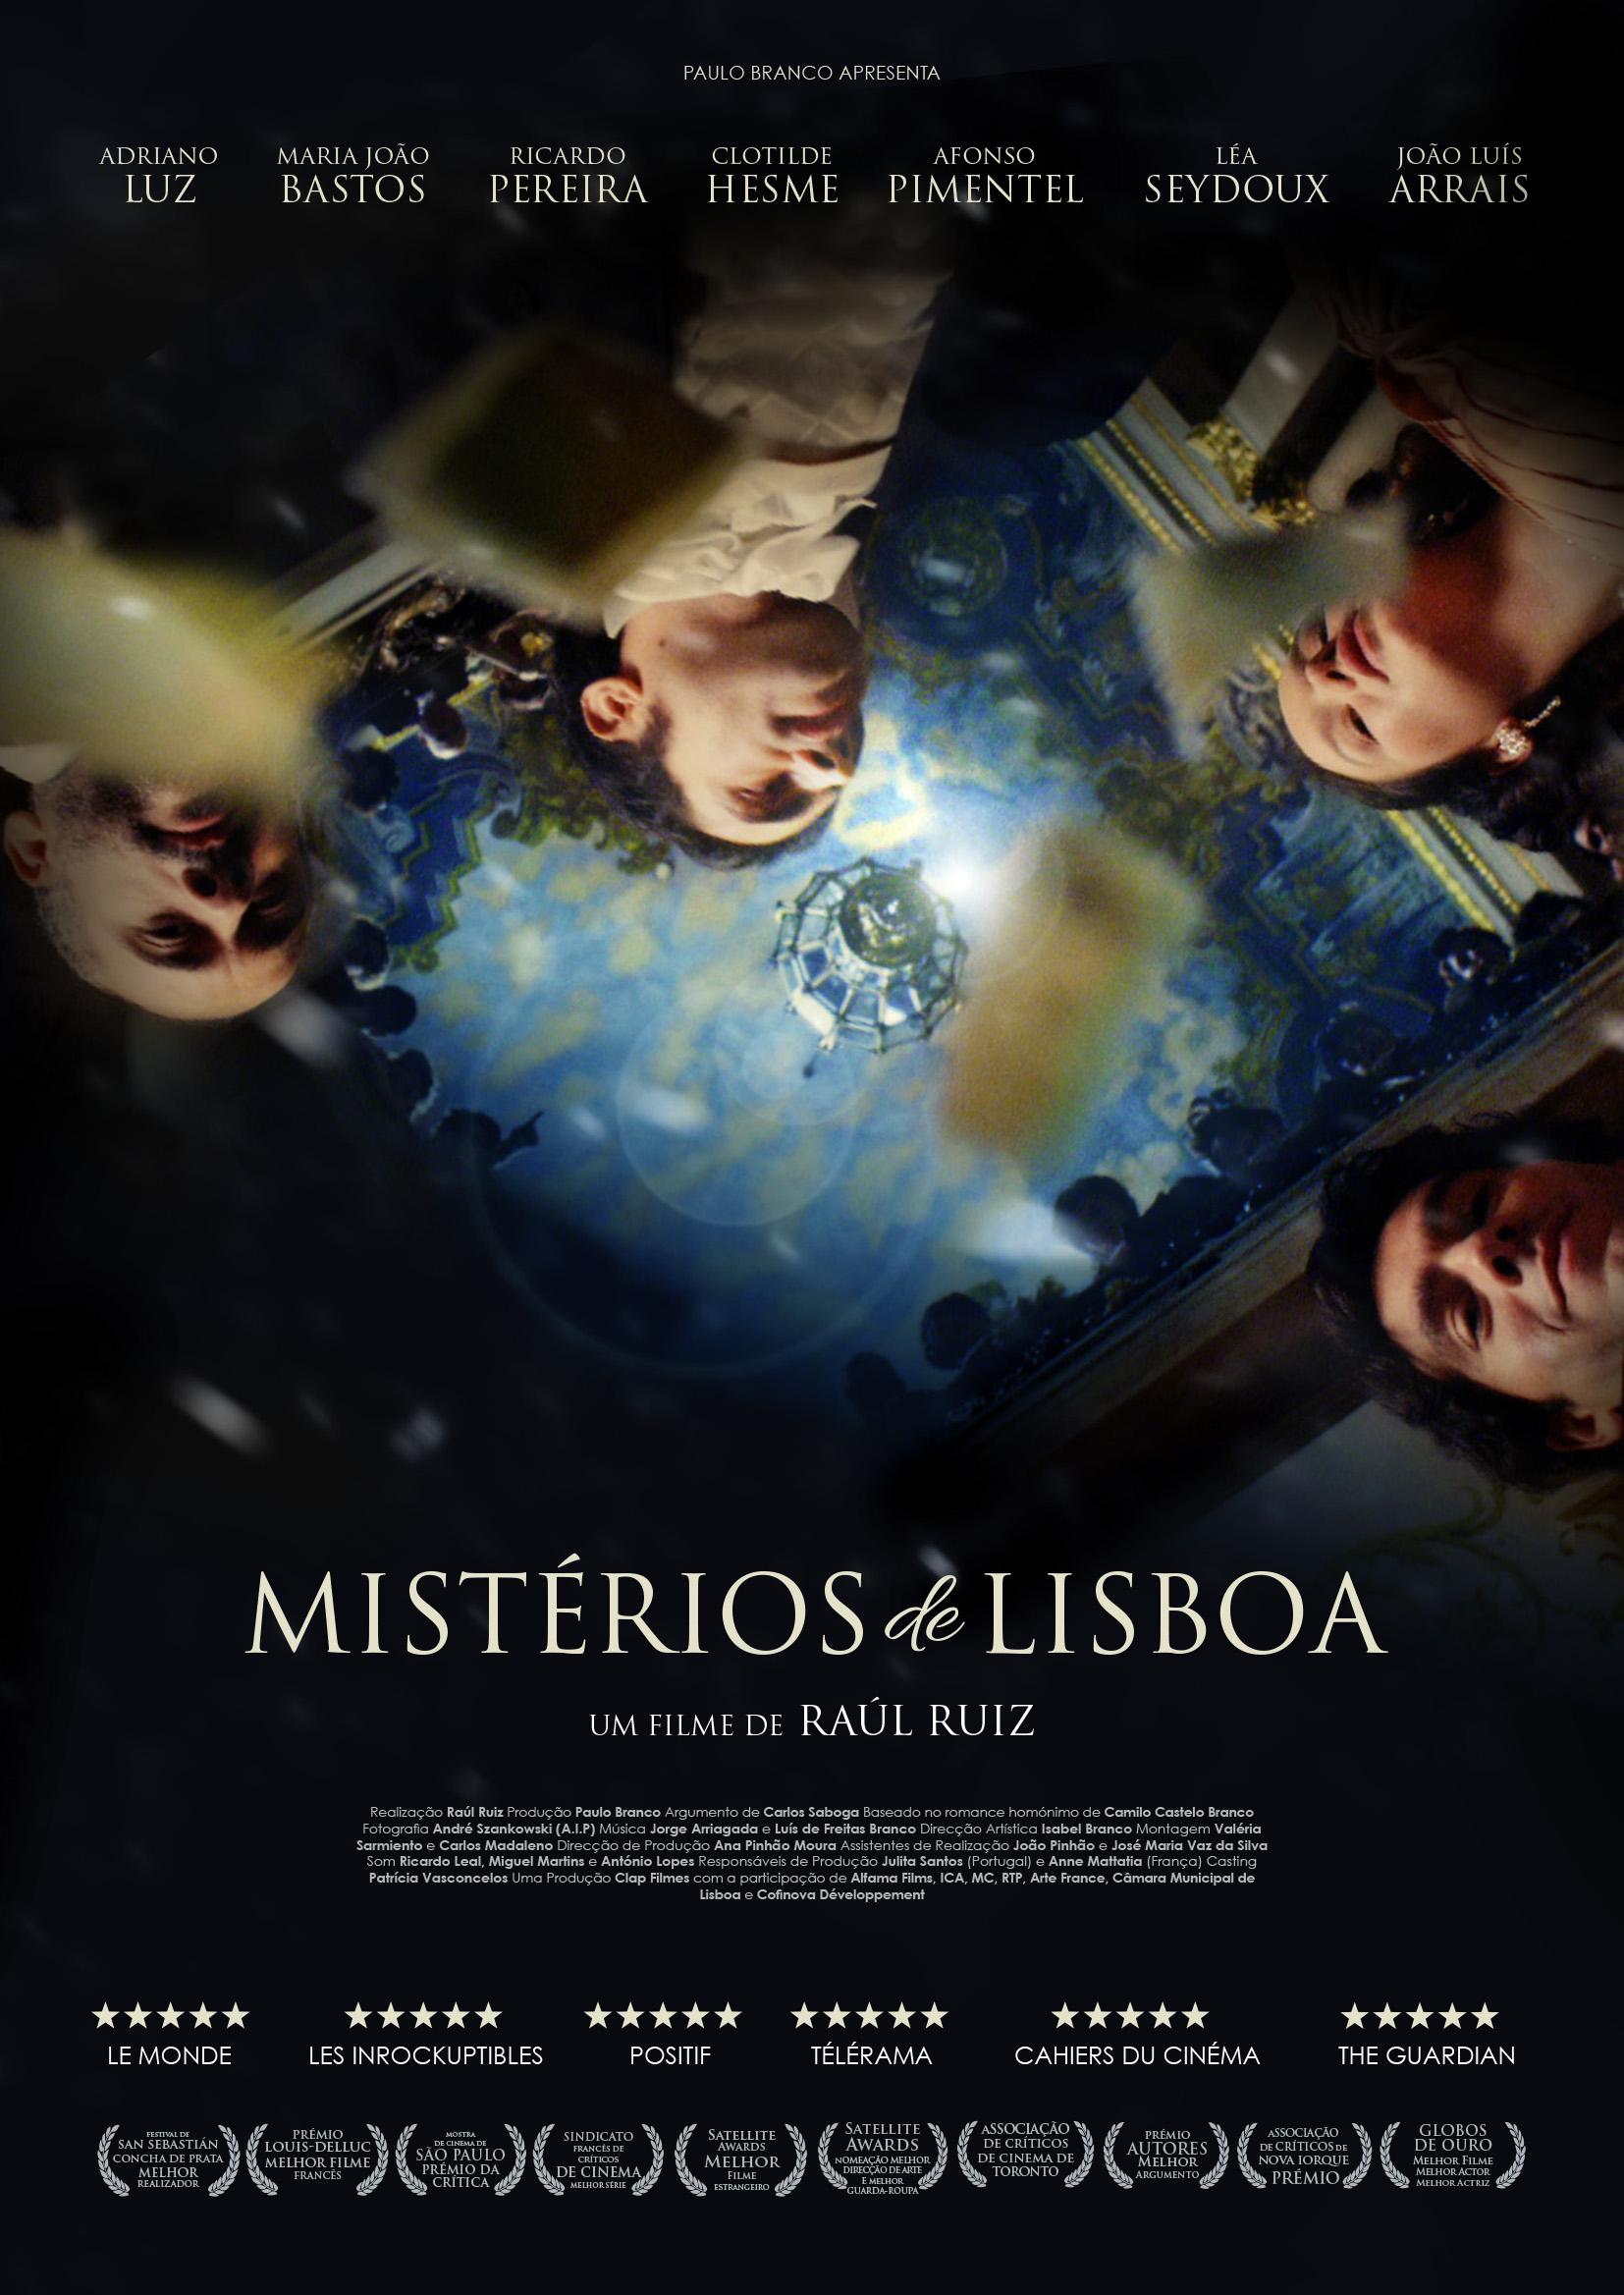 Misterios De Lisboa 2010 Imdb Mysteries of Lisbon